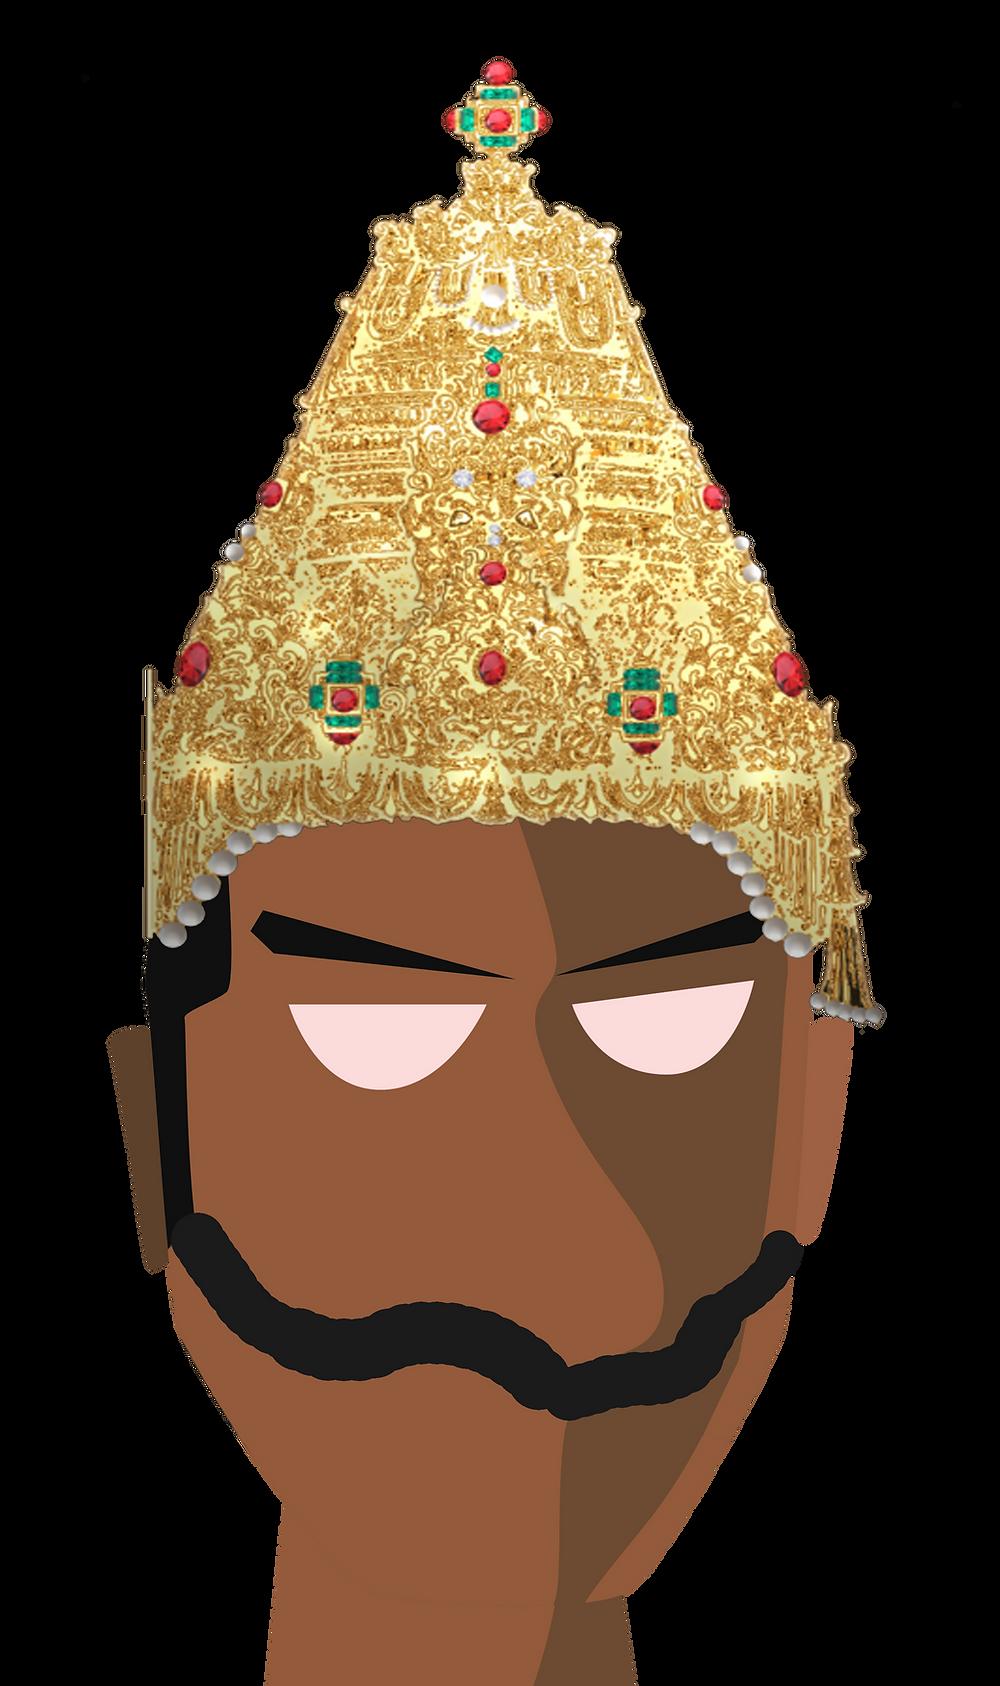 Vector portrait of the Rashtrakuta emperor Krisha III, by Arjunan Ullas based on art by Keshav Rajendran